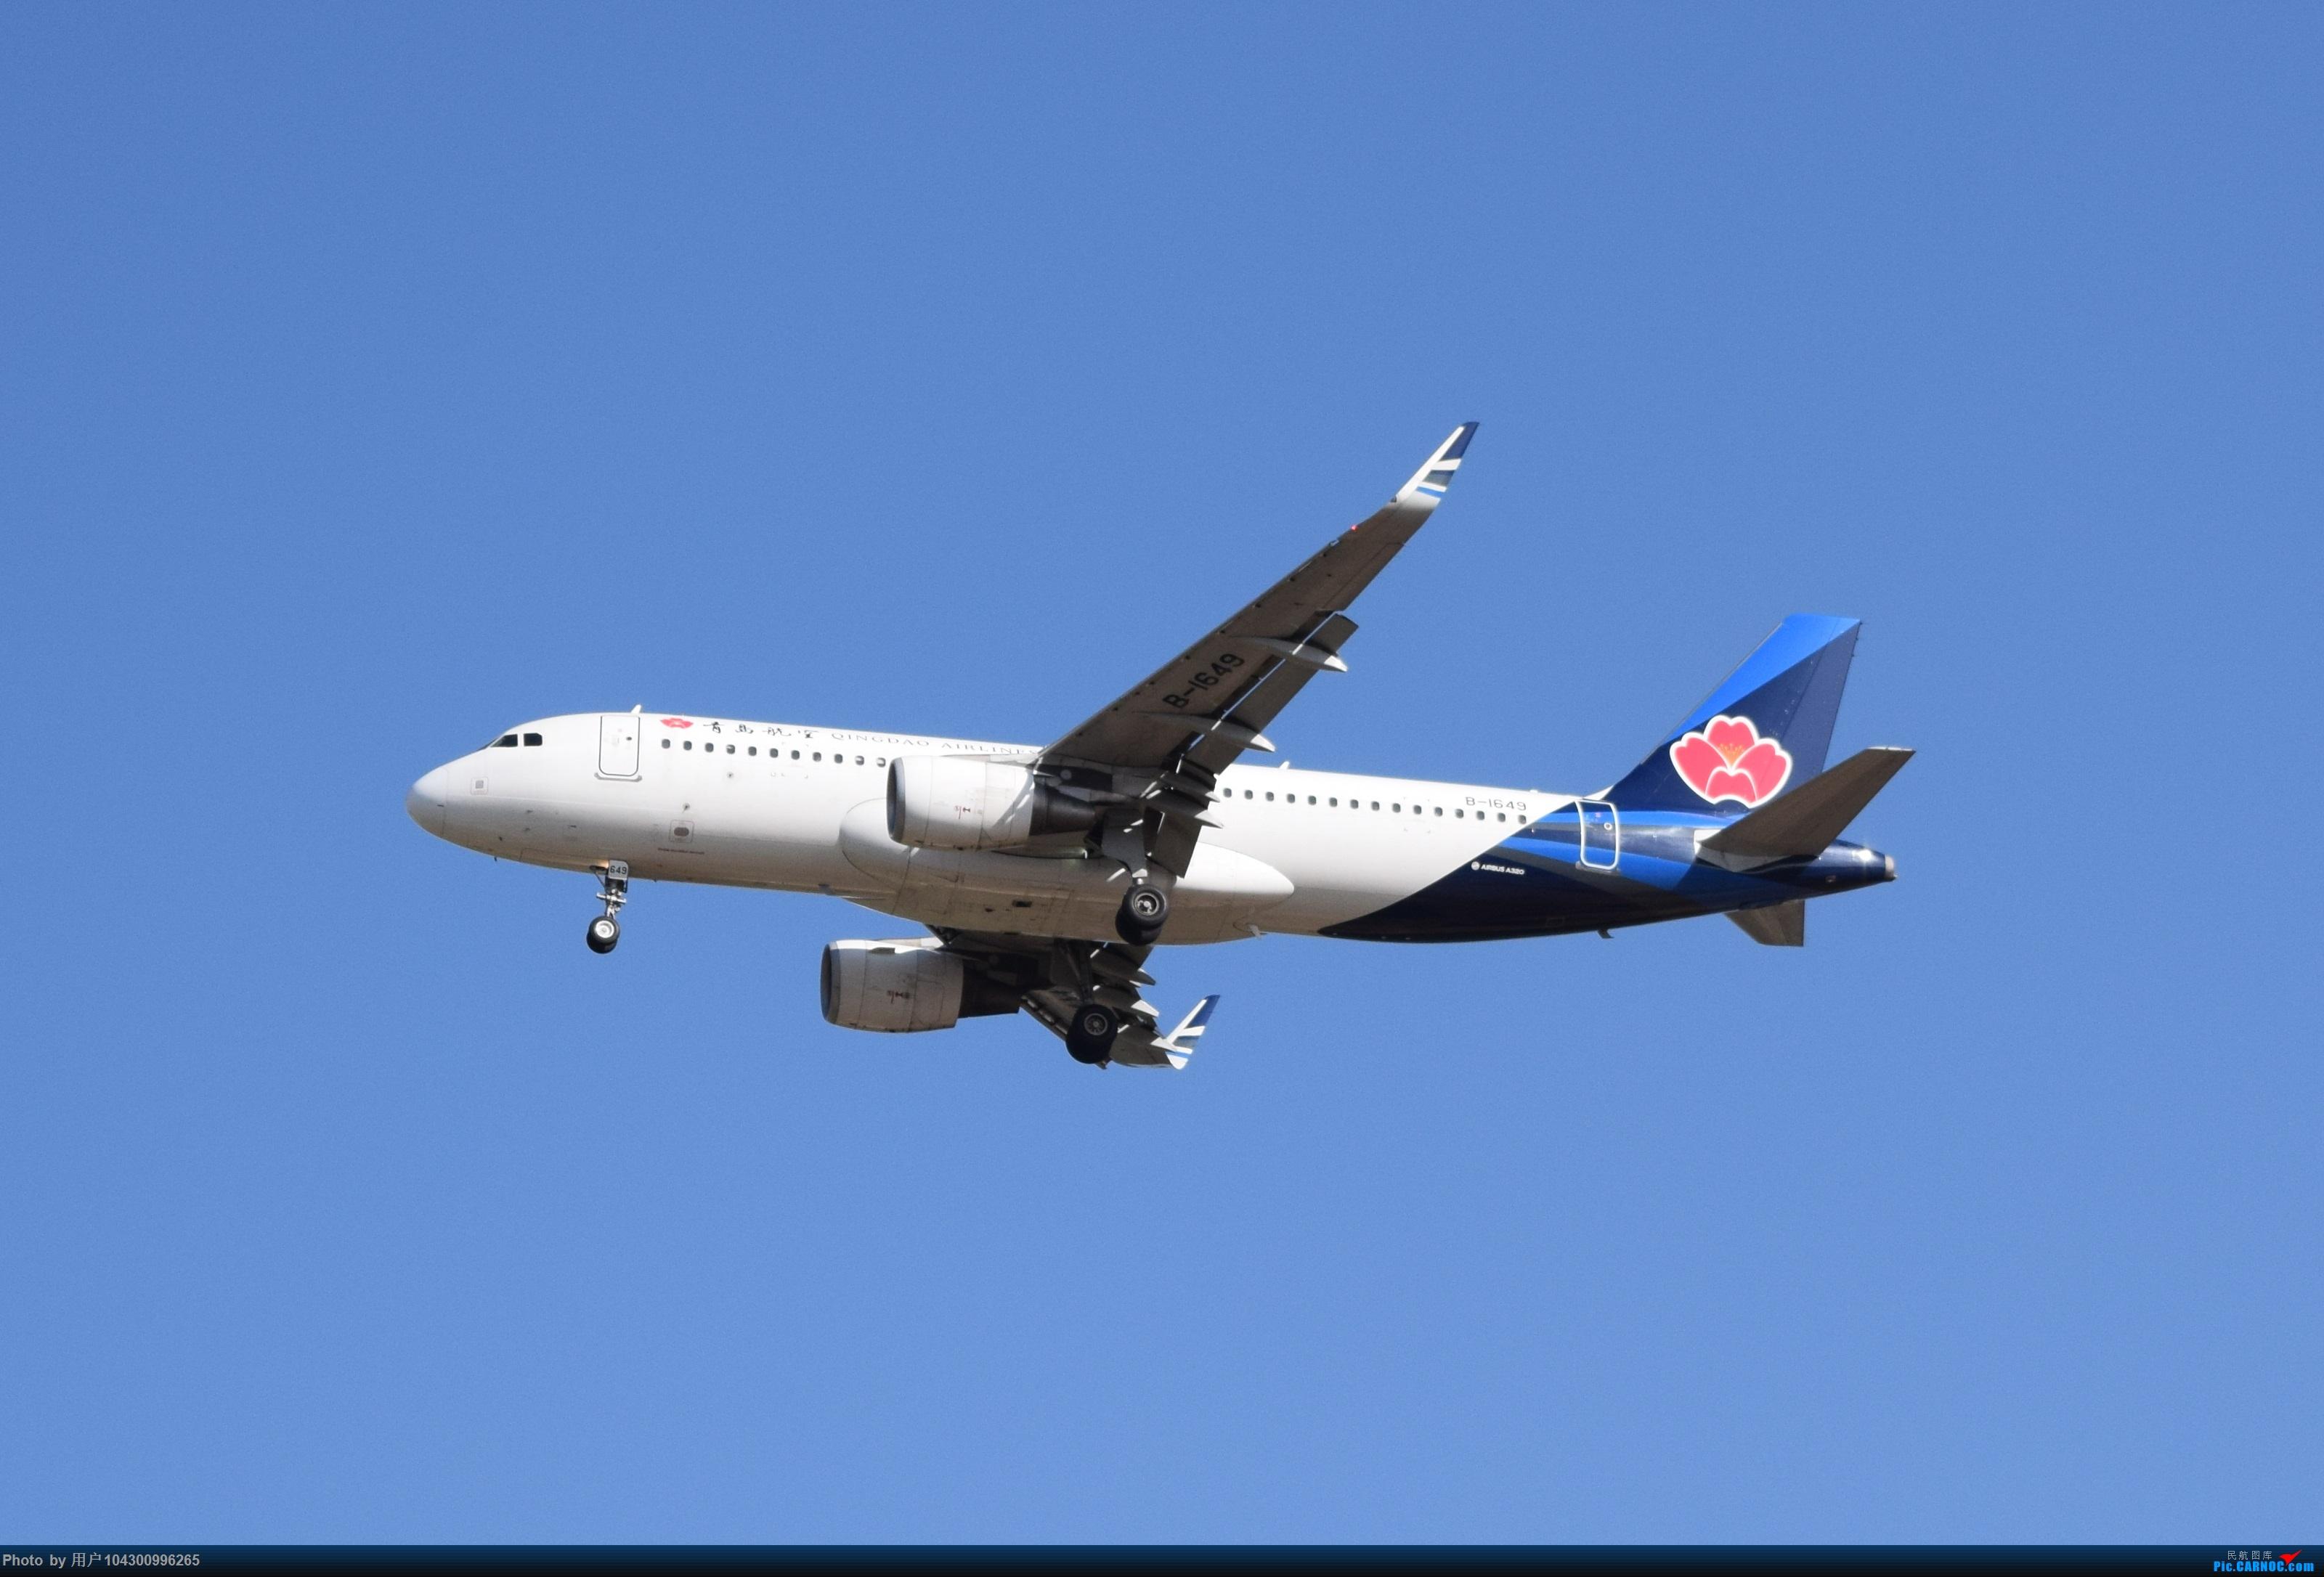 Re:[原创][KWE]贵阳今天天气不错,随便拍几张! AIRBUS A320-200 B-1649 中国贵阳龙洞堡国际机场